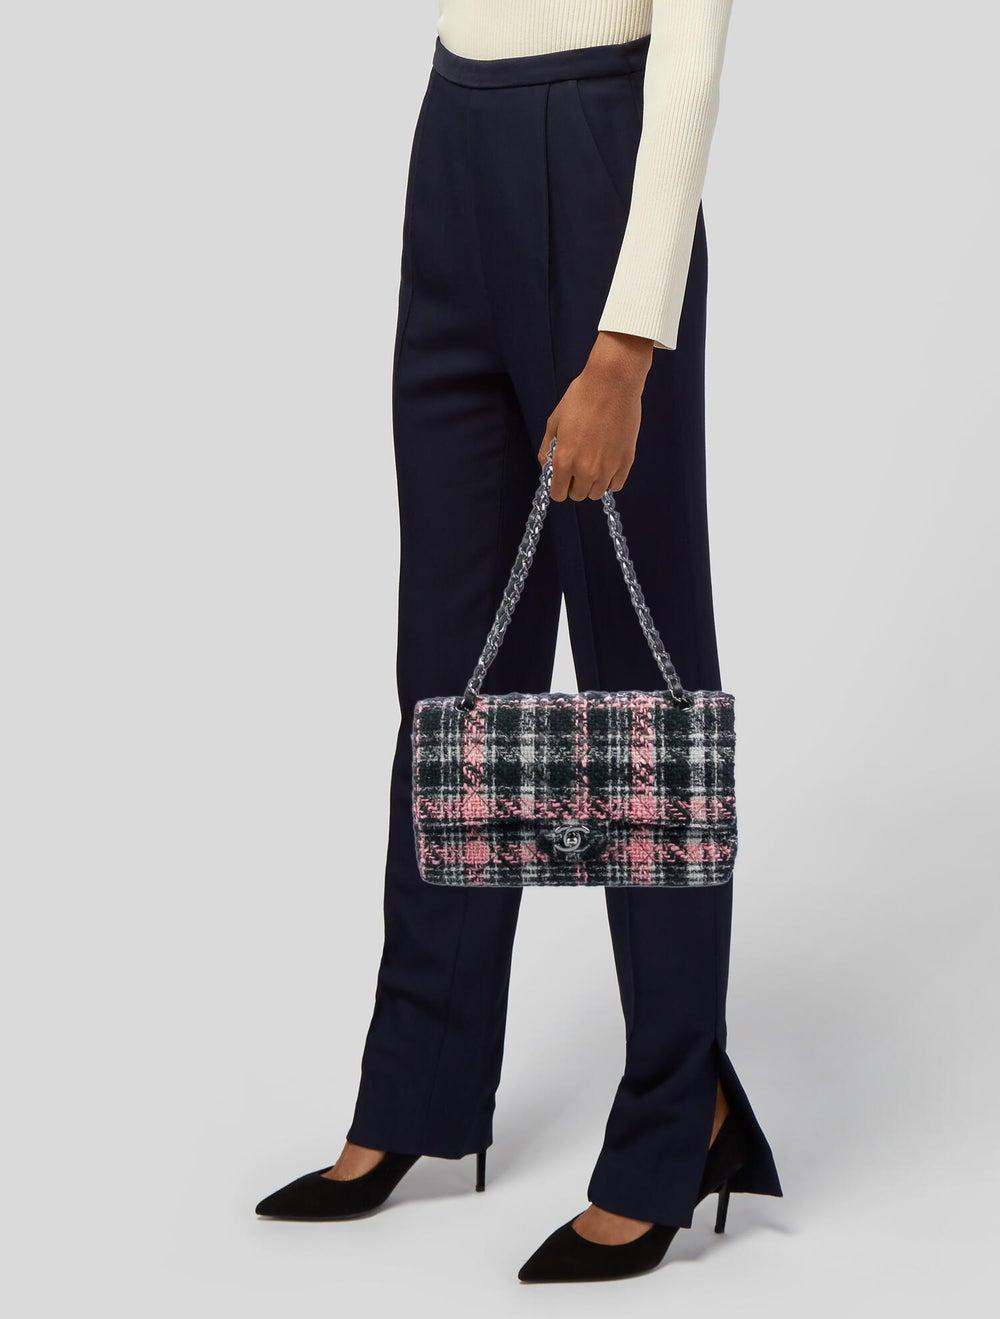 Chanel Medium Tweed Classic Double Flap Bag Blue - image 2